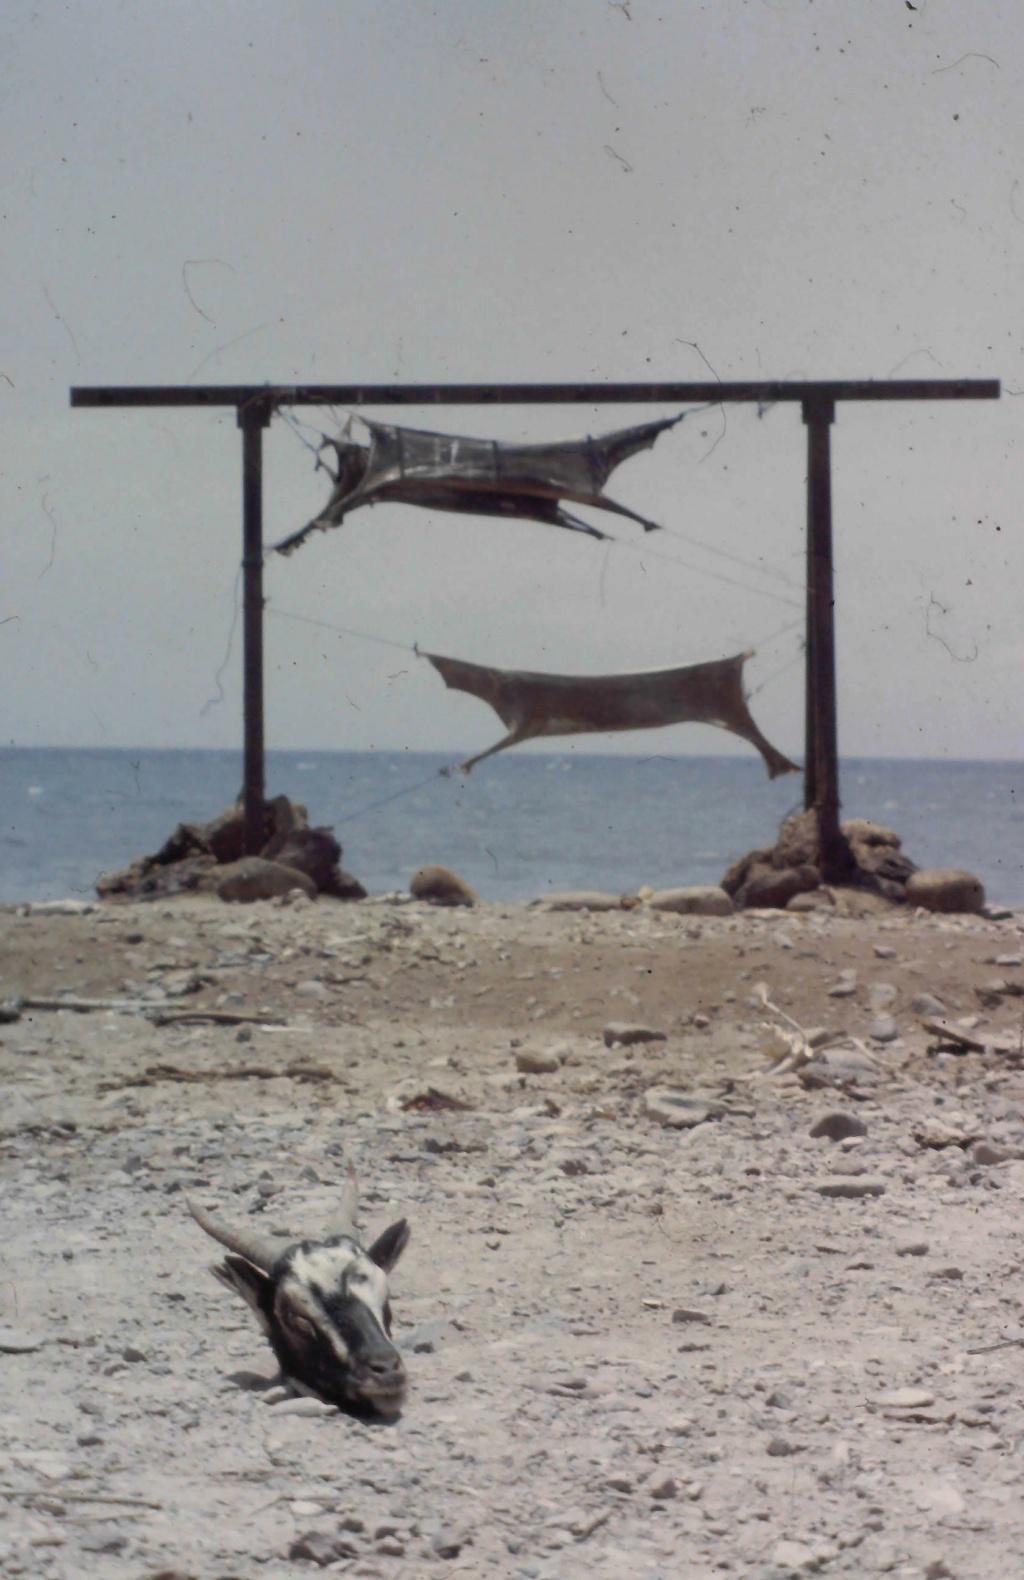 [Campagne] DJIBOUTI - TOME 1 - Page 26 20200617